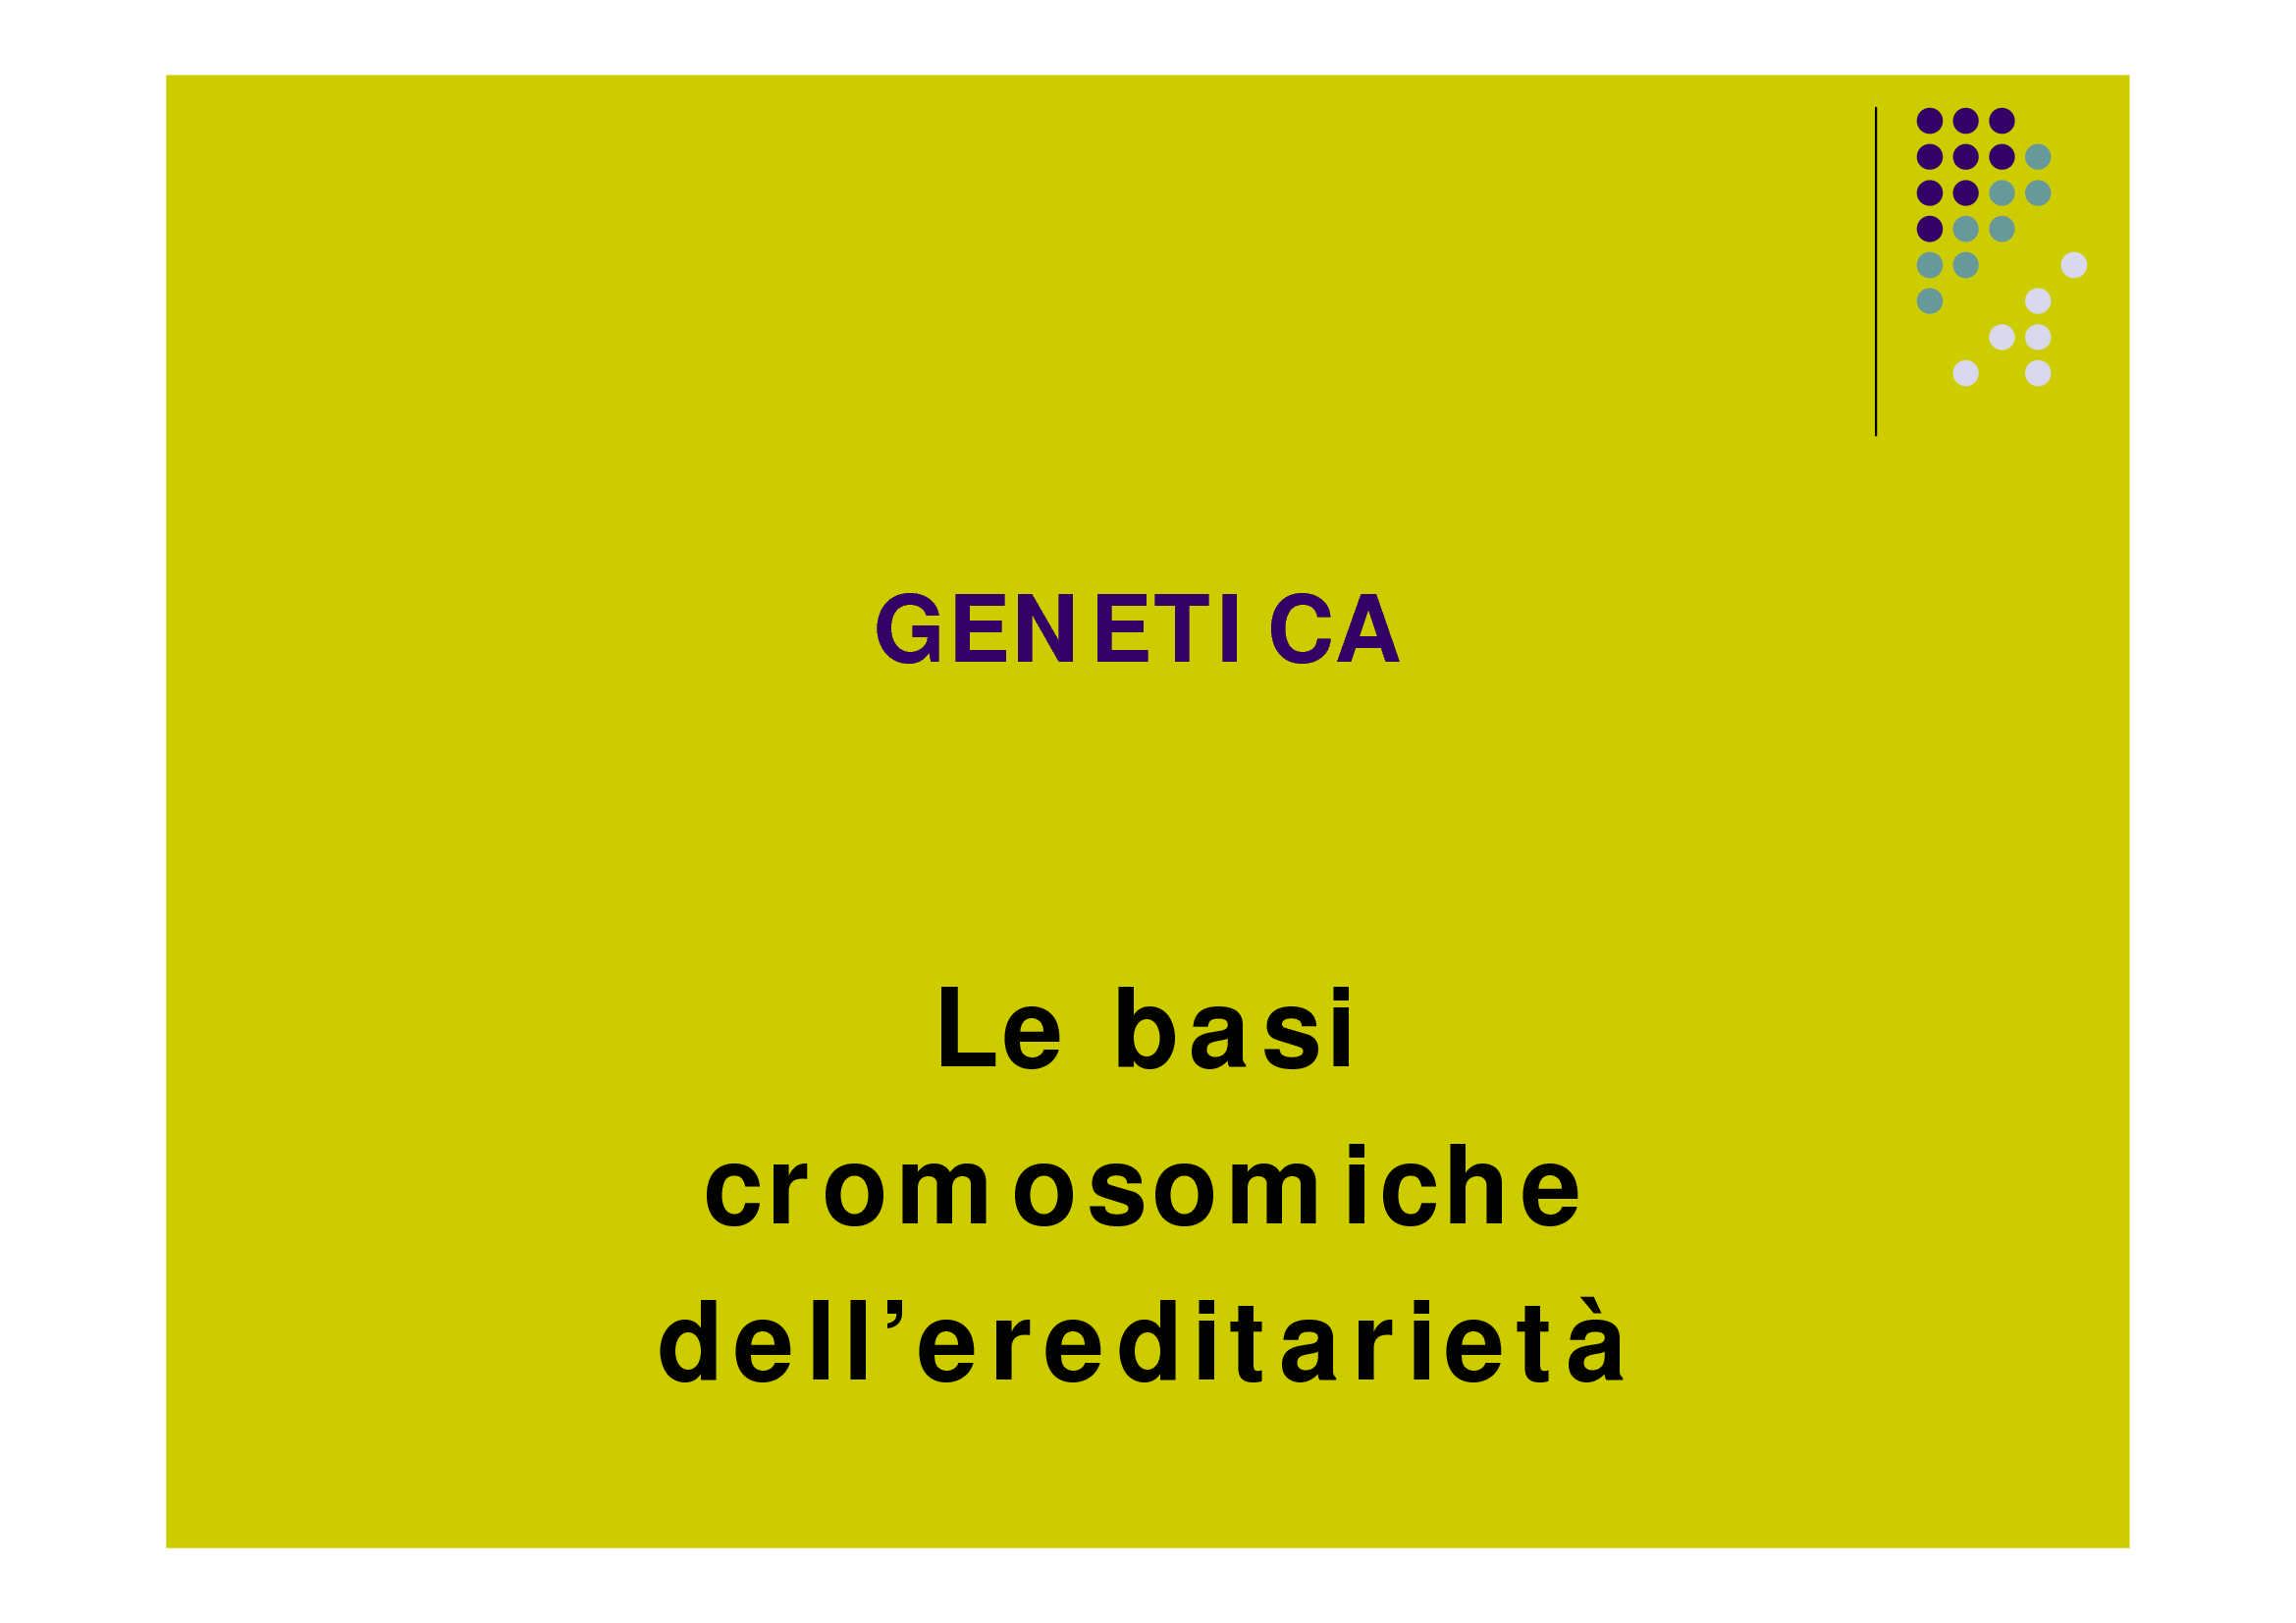 Cromosomi ed ereditarietà